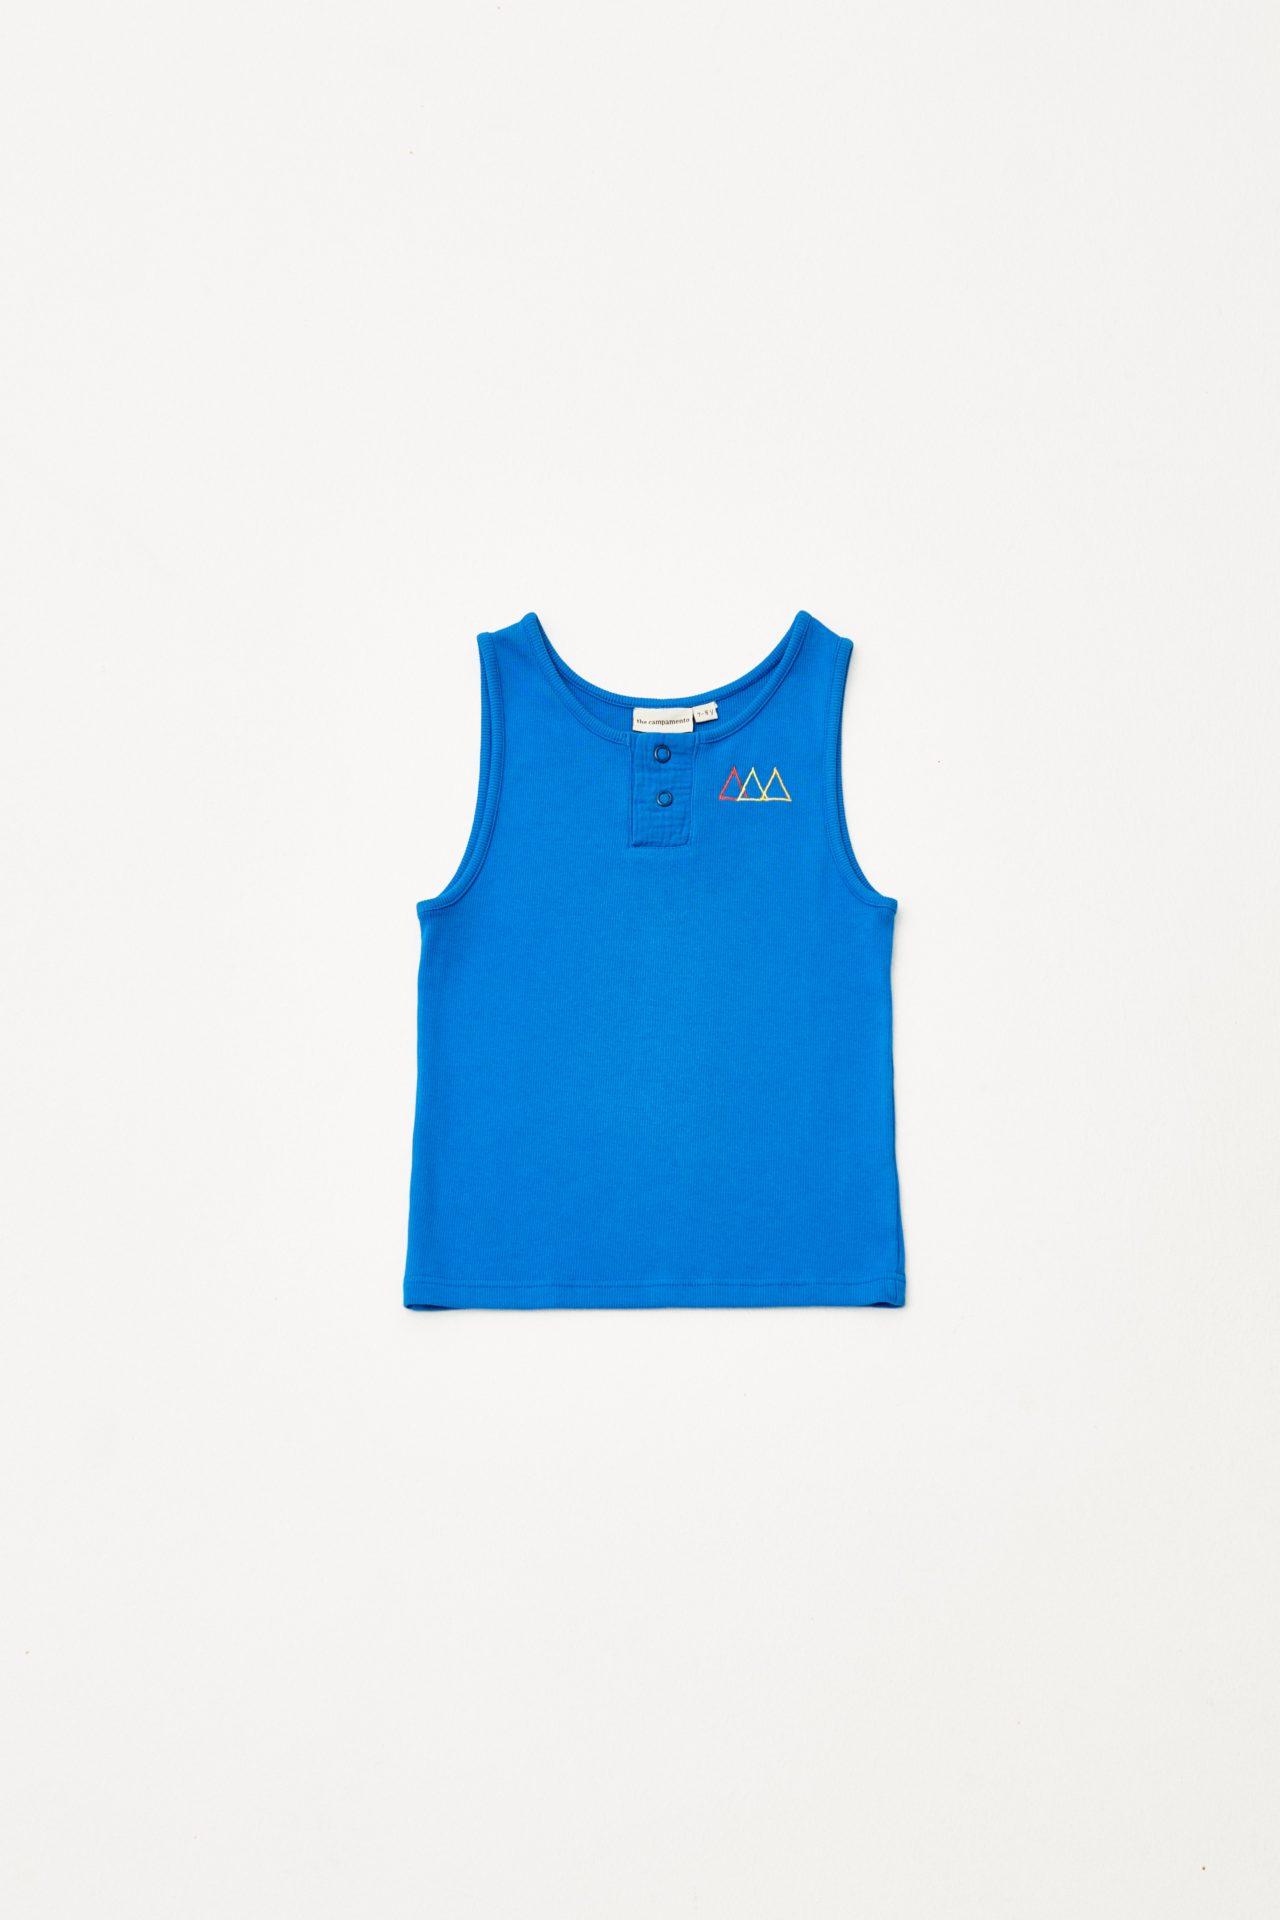 Embroidered Sleveless Tshirt